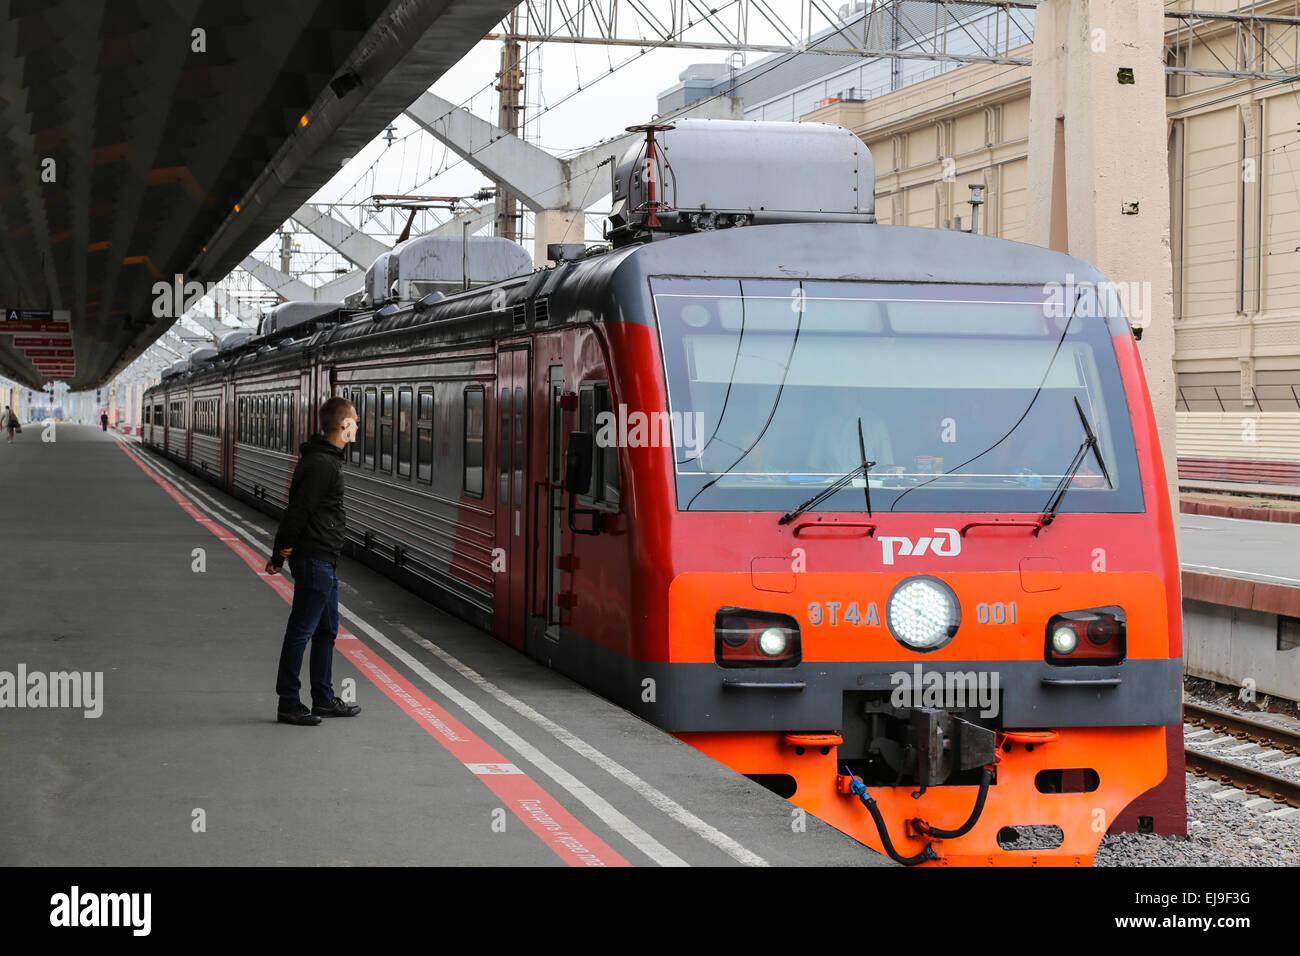 Local Train in Saint Petersburg - Stock Image